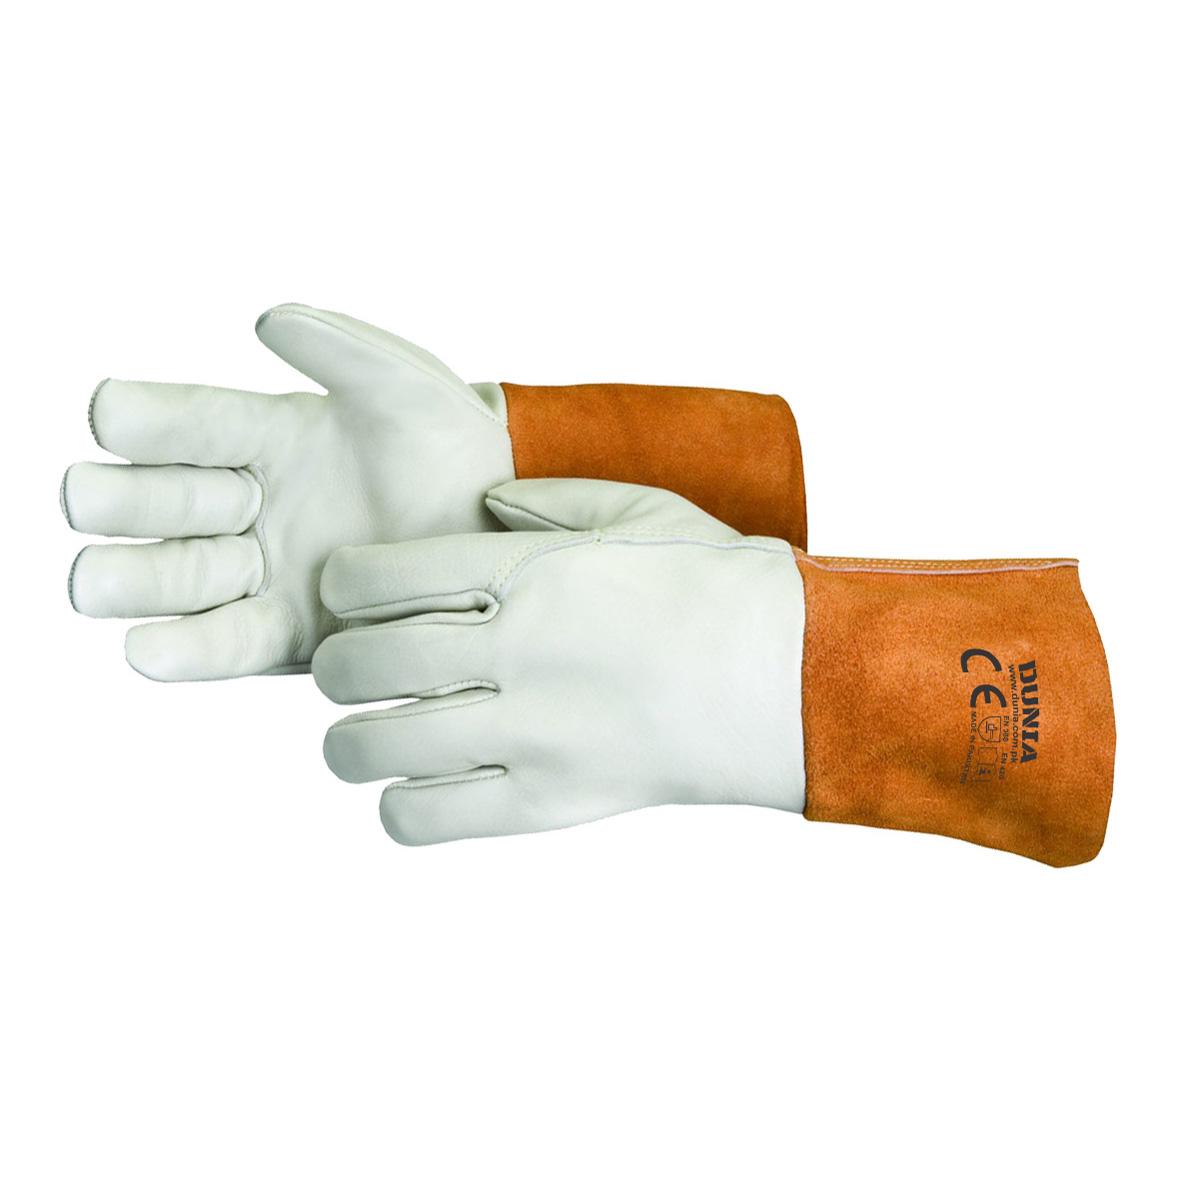 DTC-772-OG Tig Welder Gloves Orange